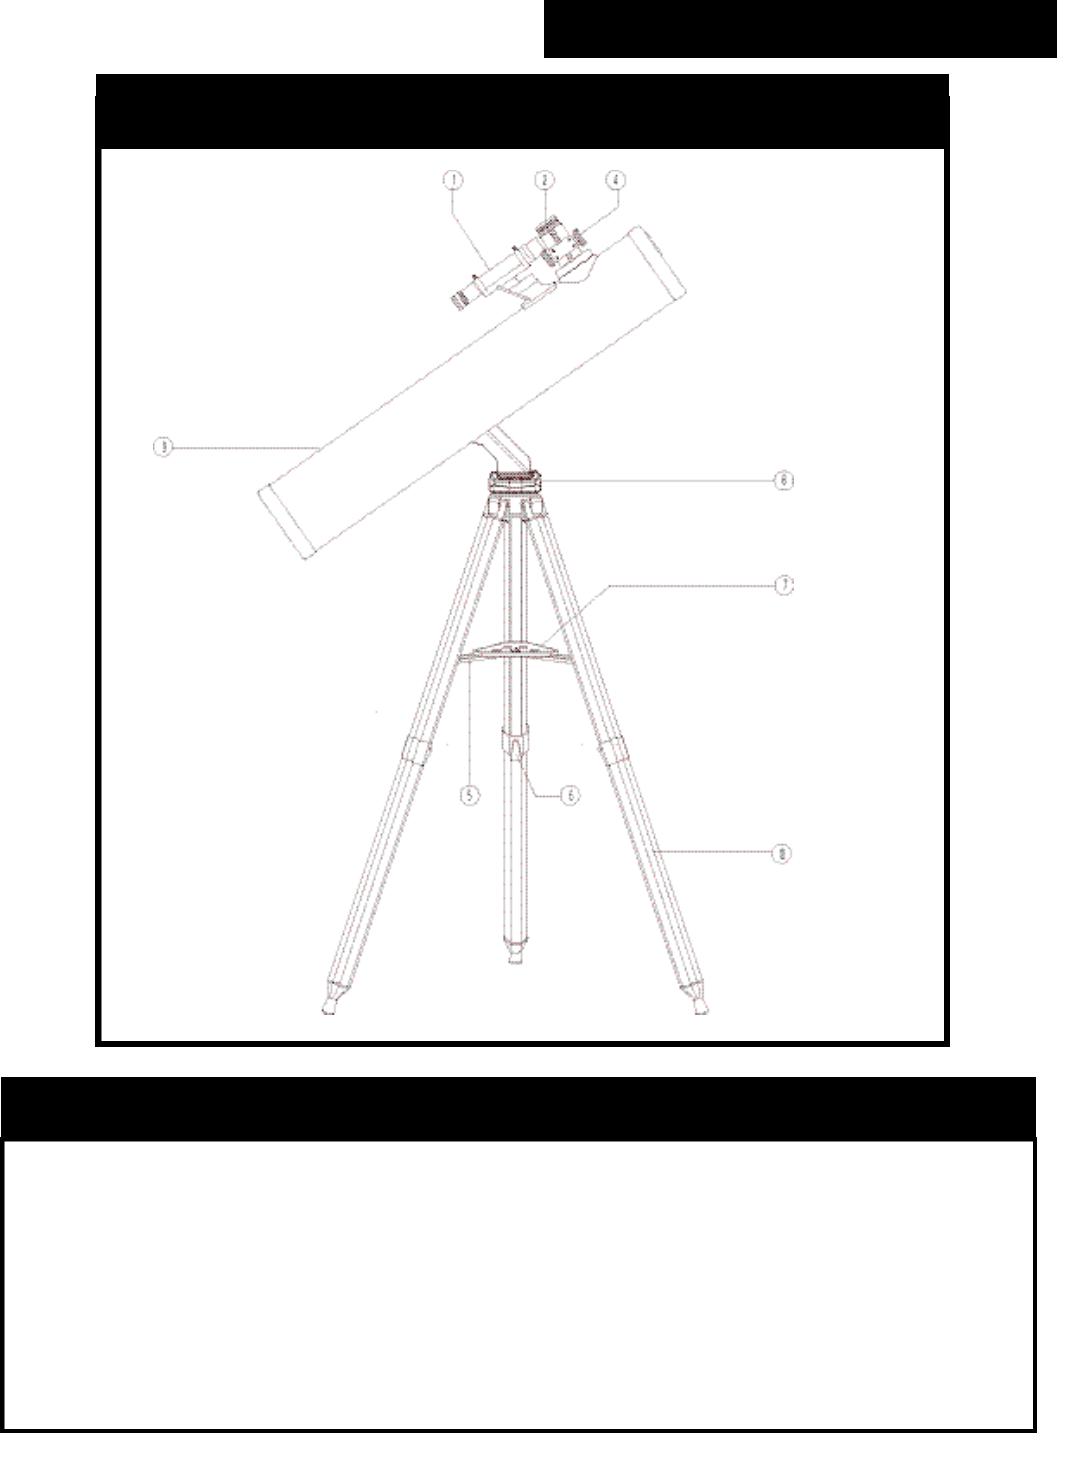 Bushnell 78-7830 Telescope Parts Diagram